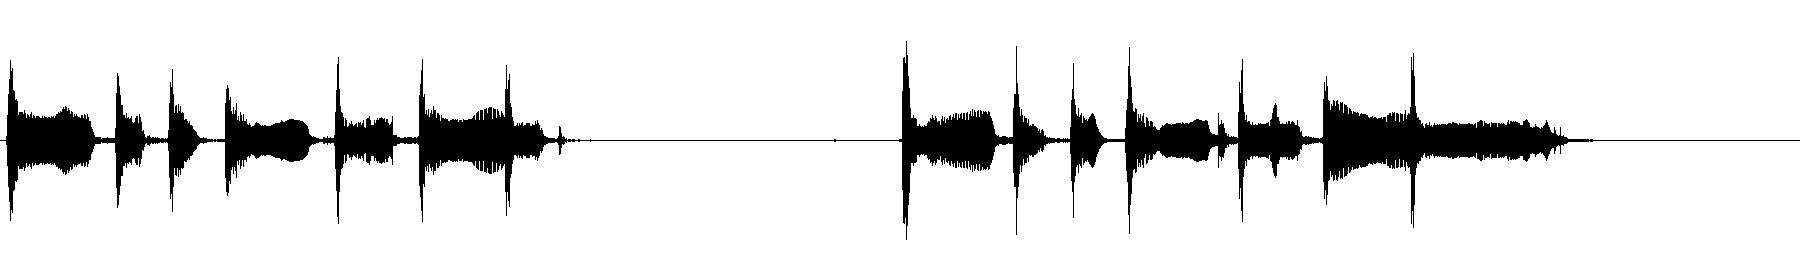 115 cm 15 tele octs